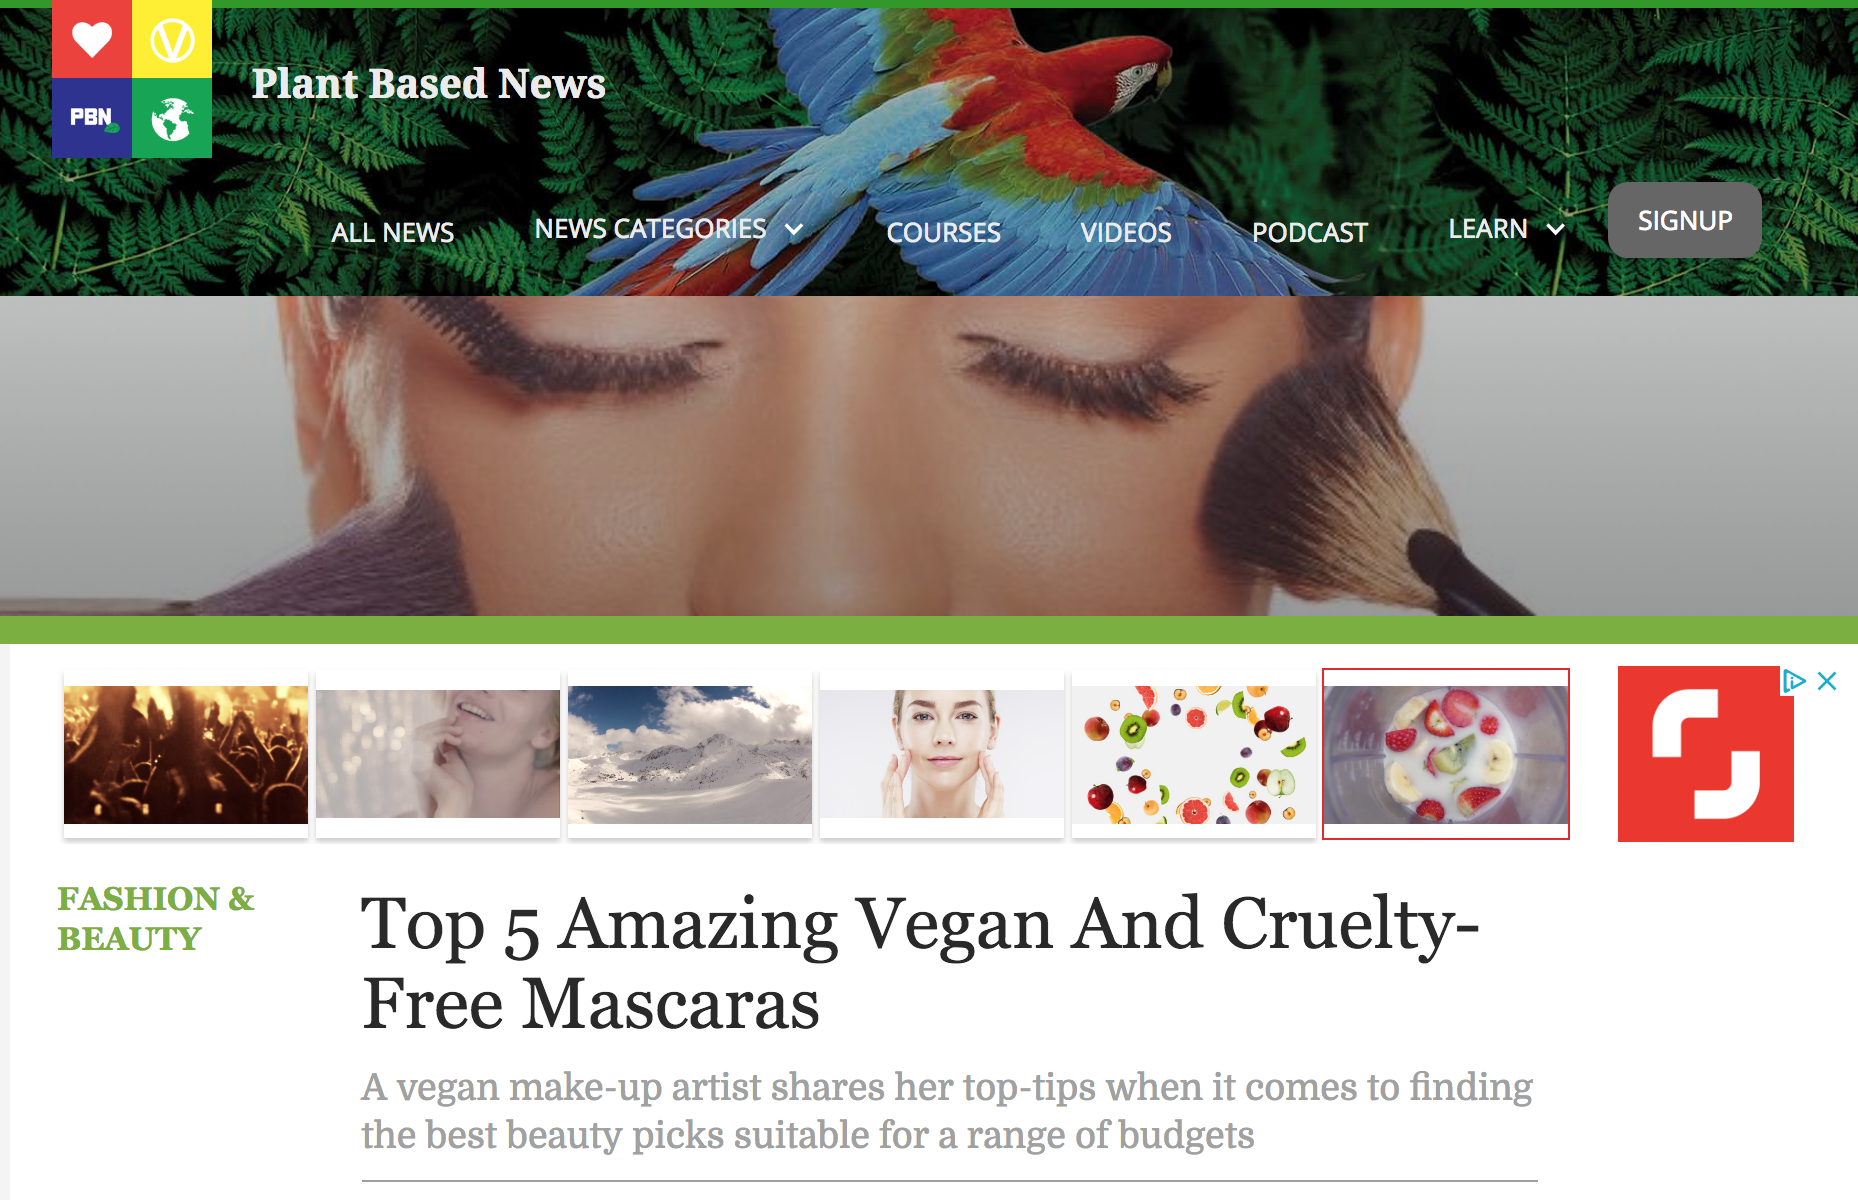 PLANT BASED NEWS - REGULAR ARTICLES